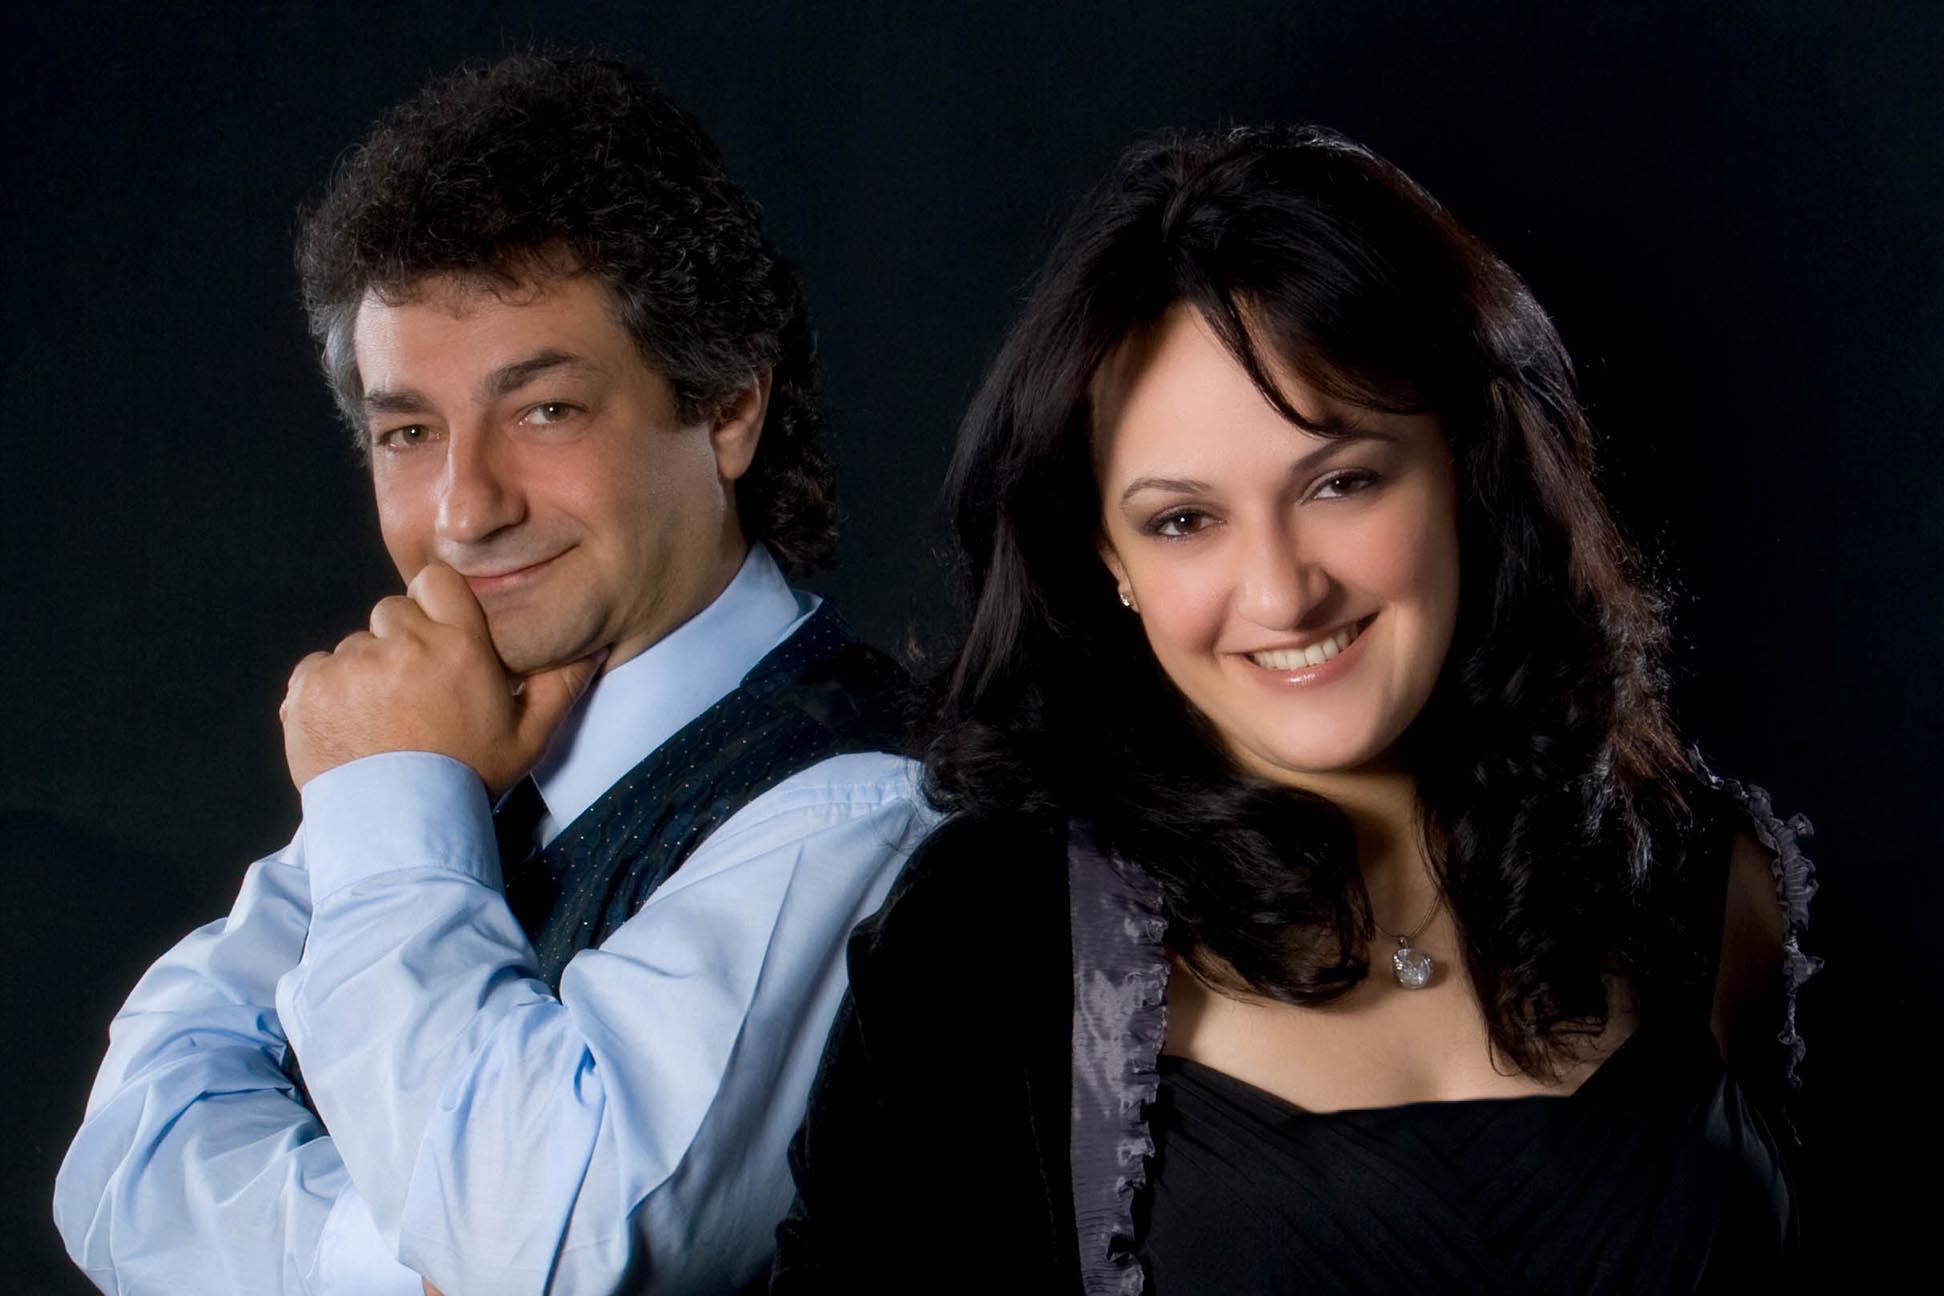 portrait of a couple with black backgroud